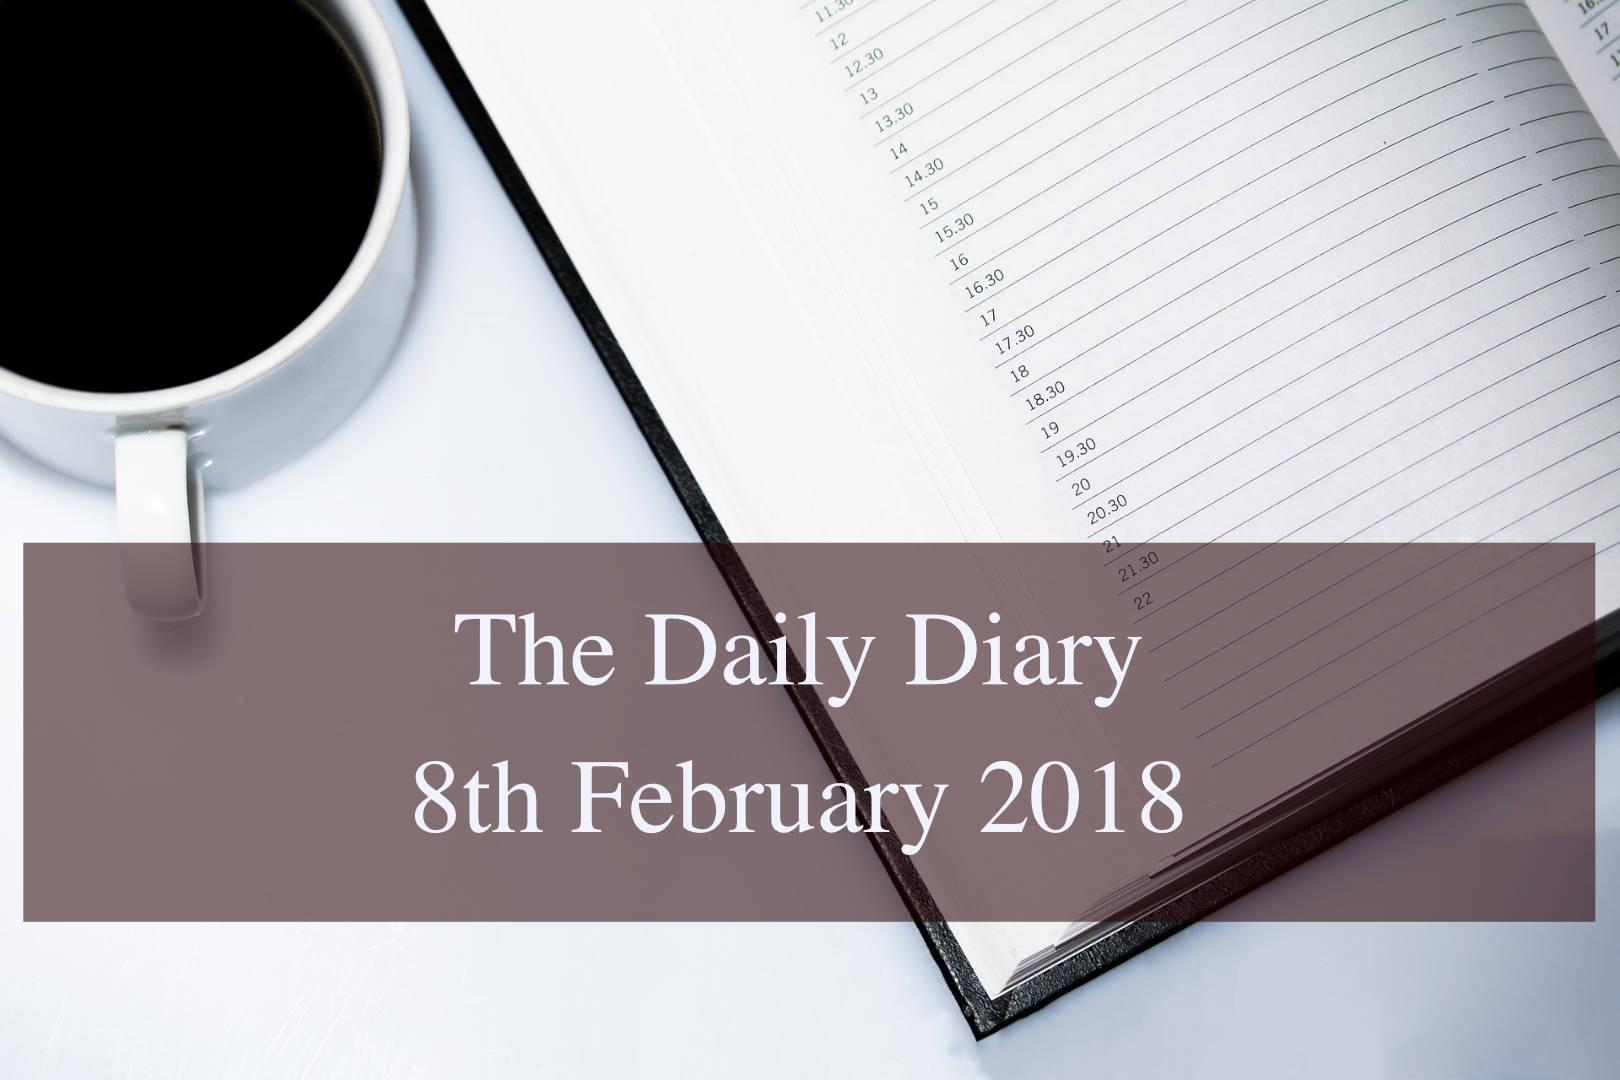 Daily Diary 8th February 2018